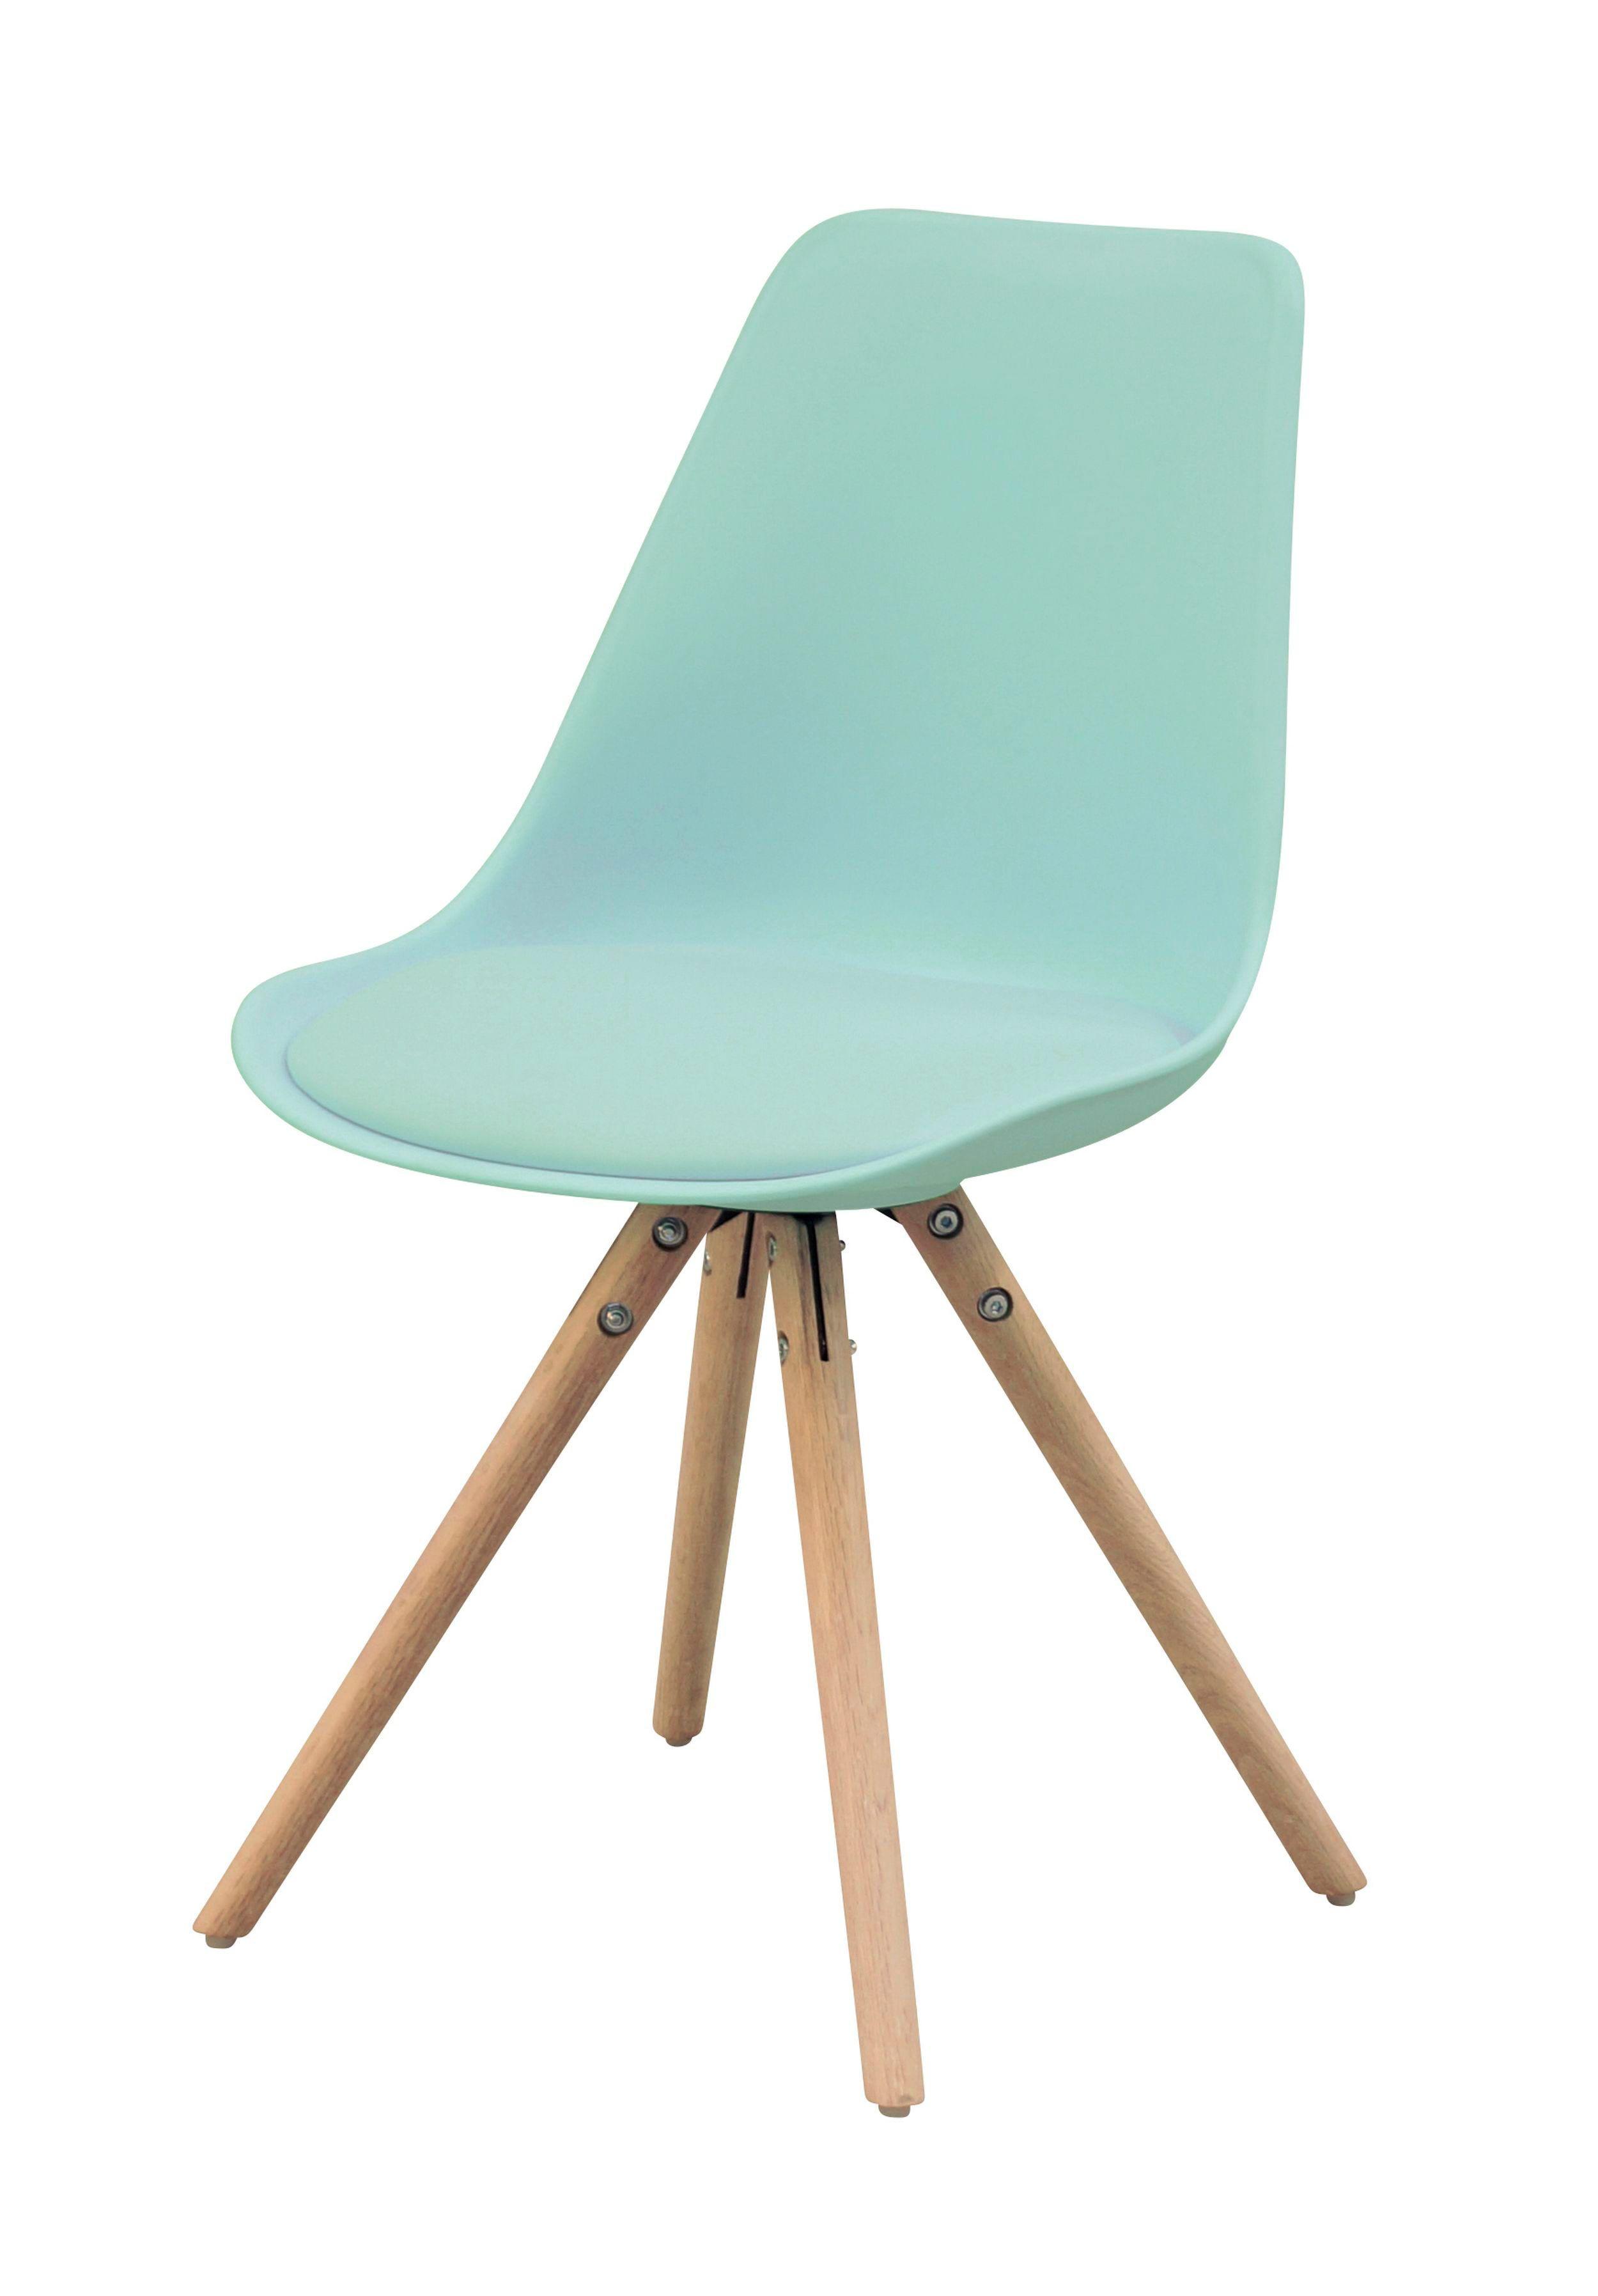 chaise oslo vert d 39 eau design scandinave but vert d. Black Bedroom Furniture Sets. Home Design Ideas